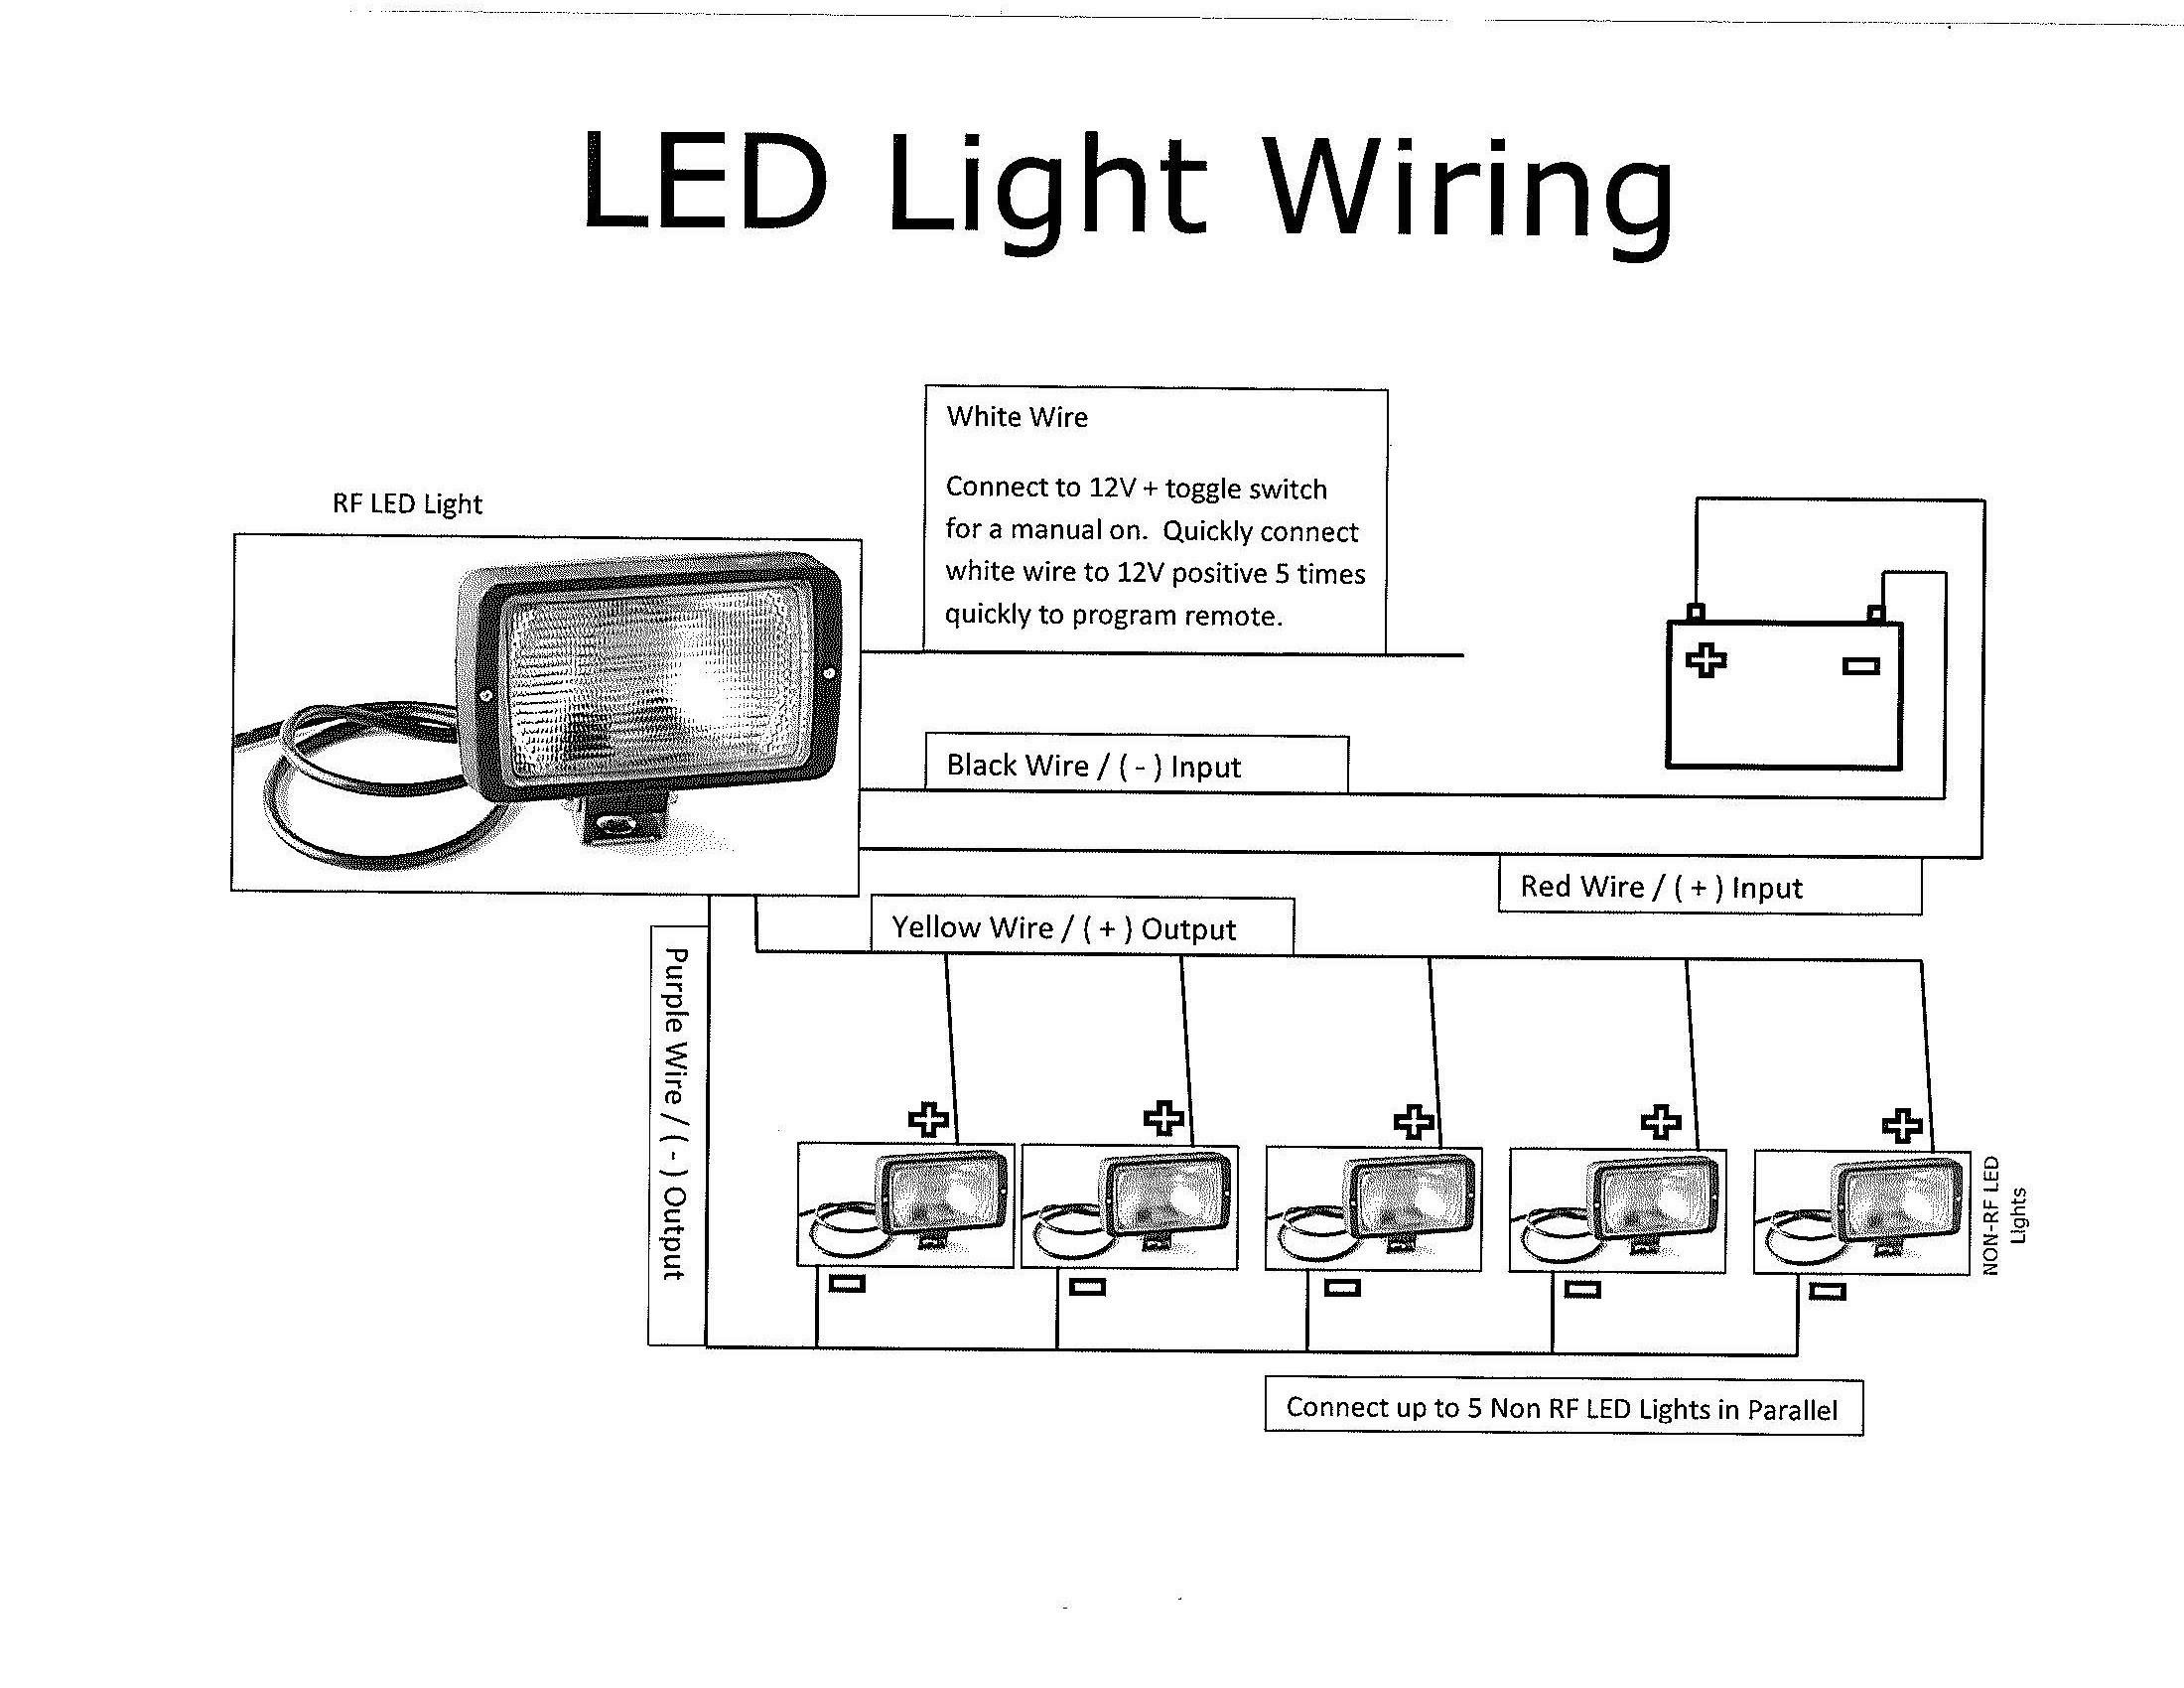 Fluro Light Wiring Diagram Australia New Wiring Diagram for Led Tube Lights Archives Gidn Best Wiring